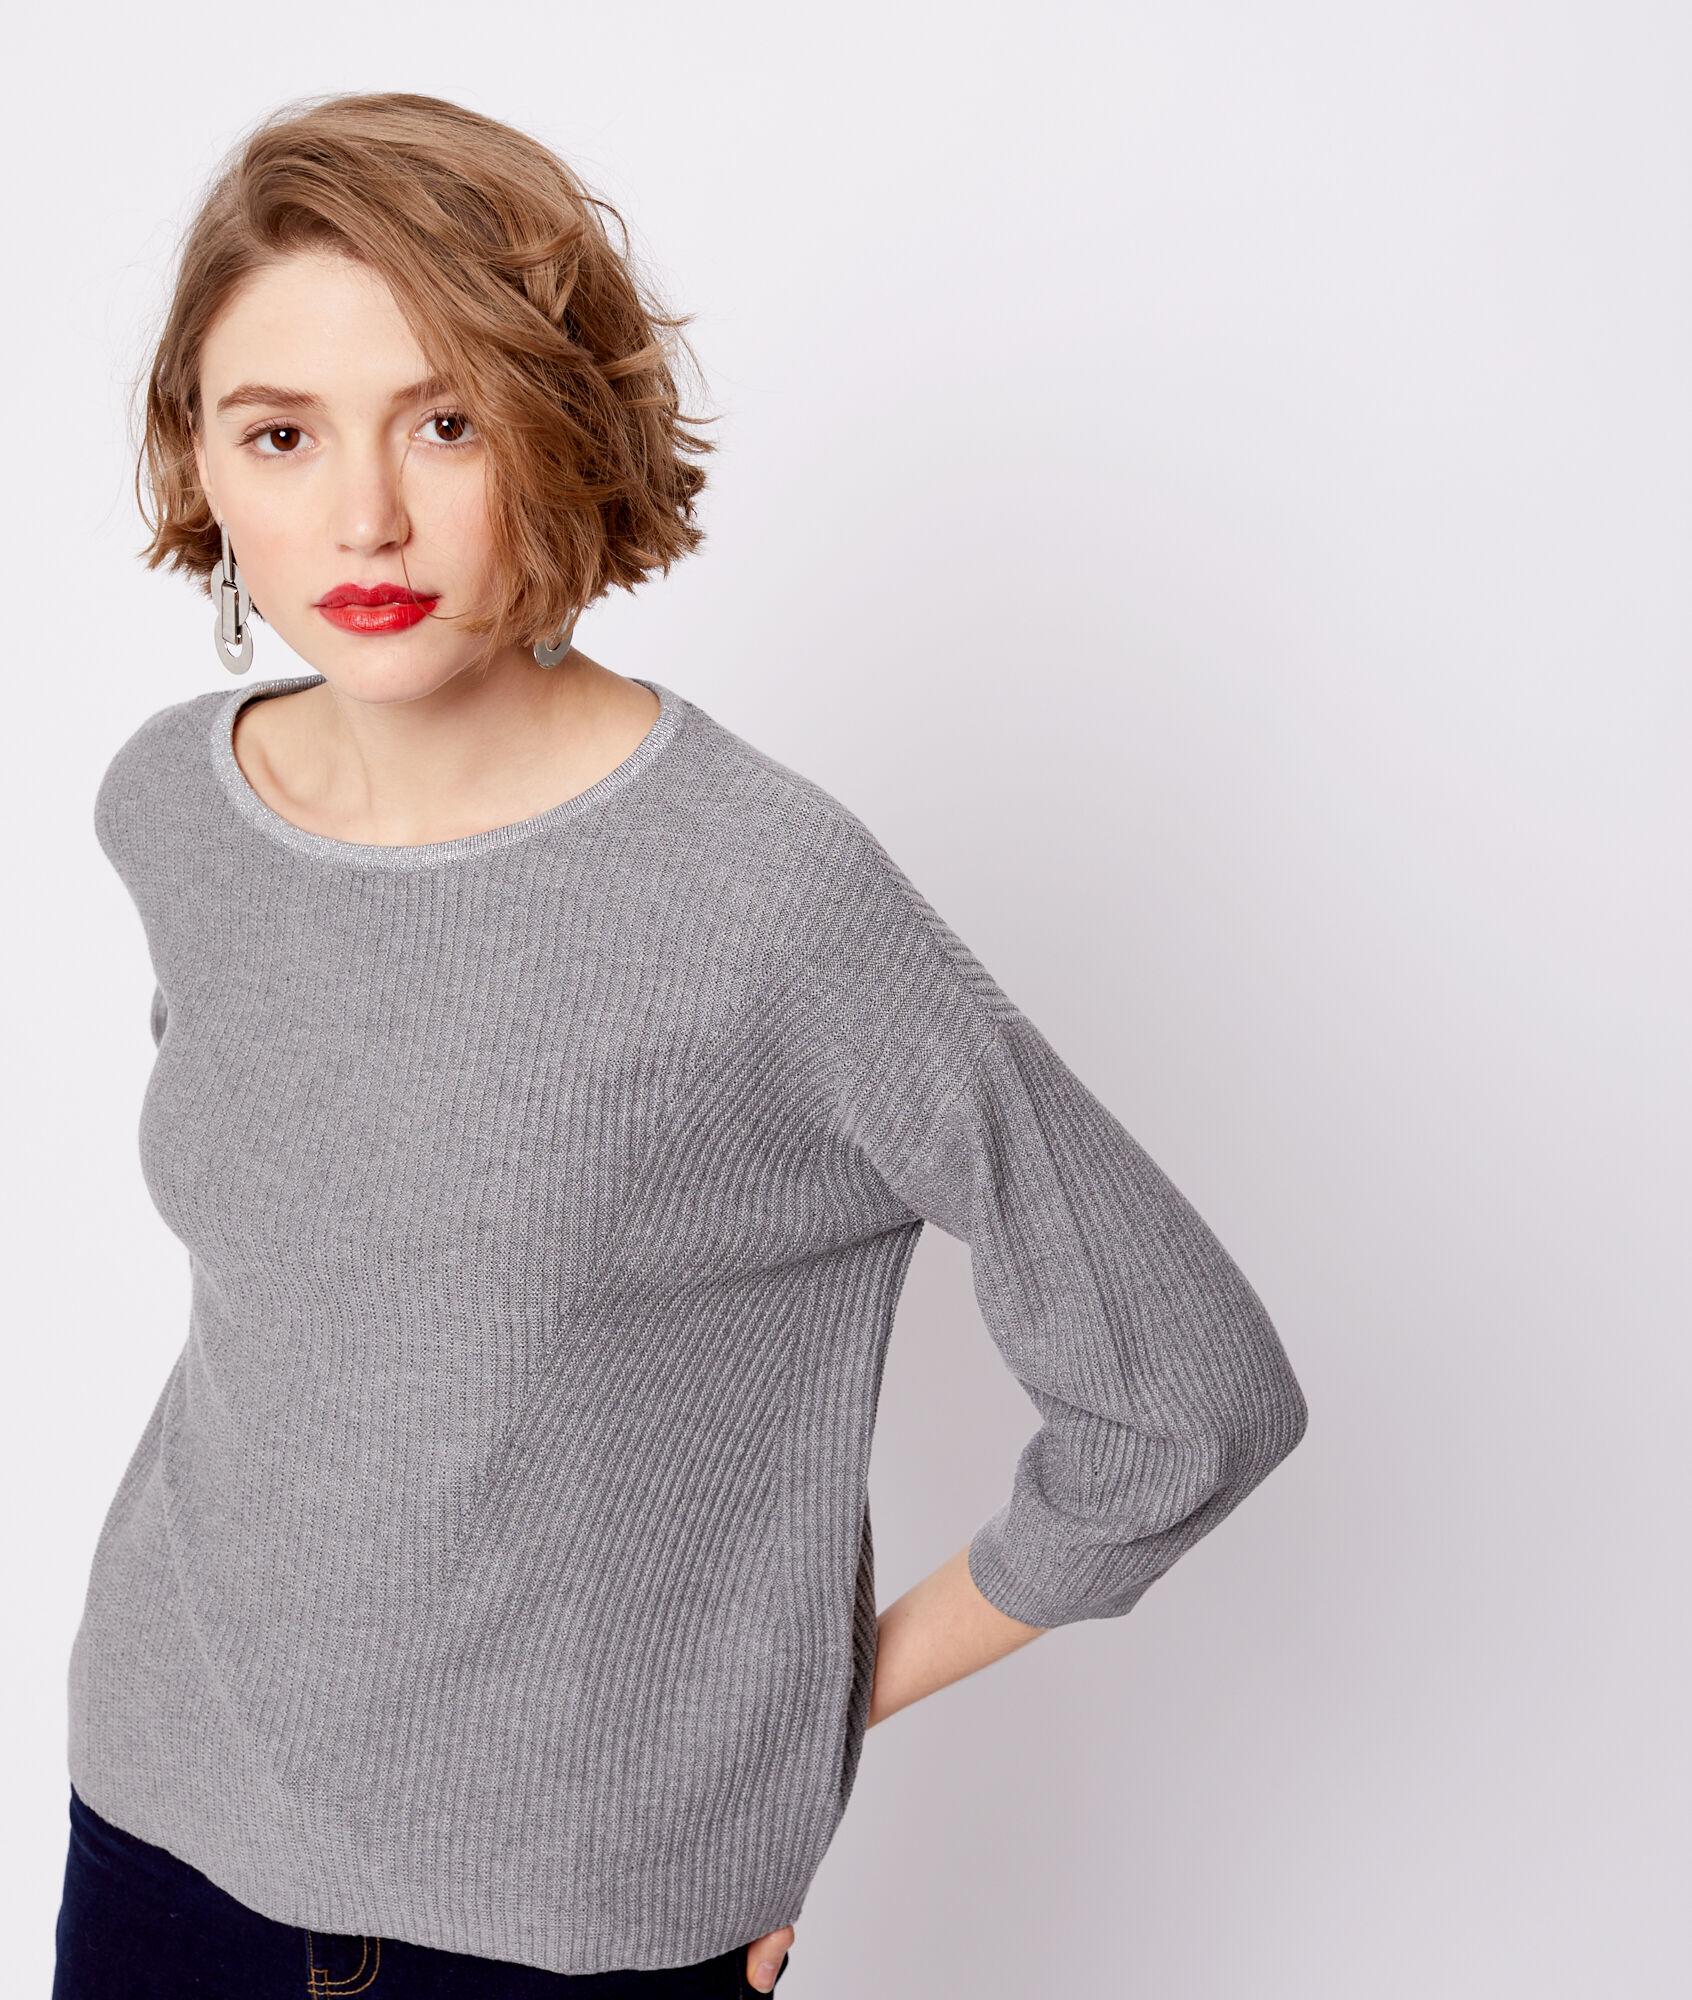 Y Moda Mujer Cárdigans Online Jerséis De Etam wa6xAqv